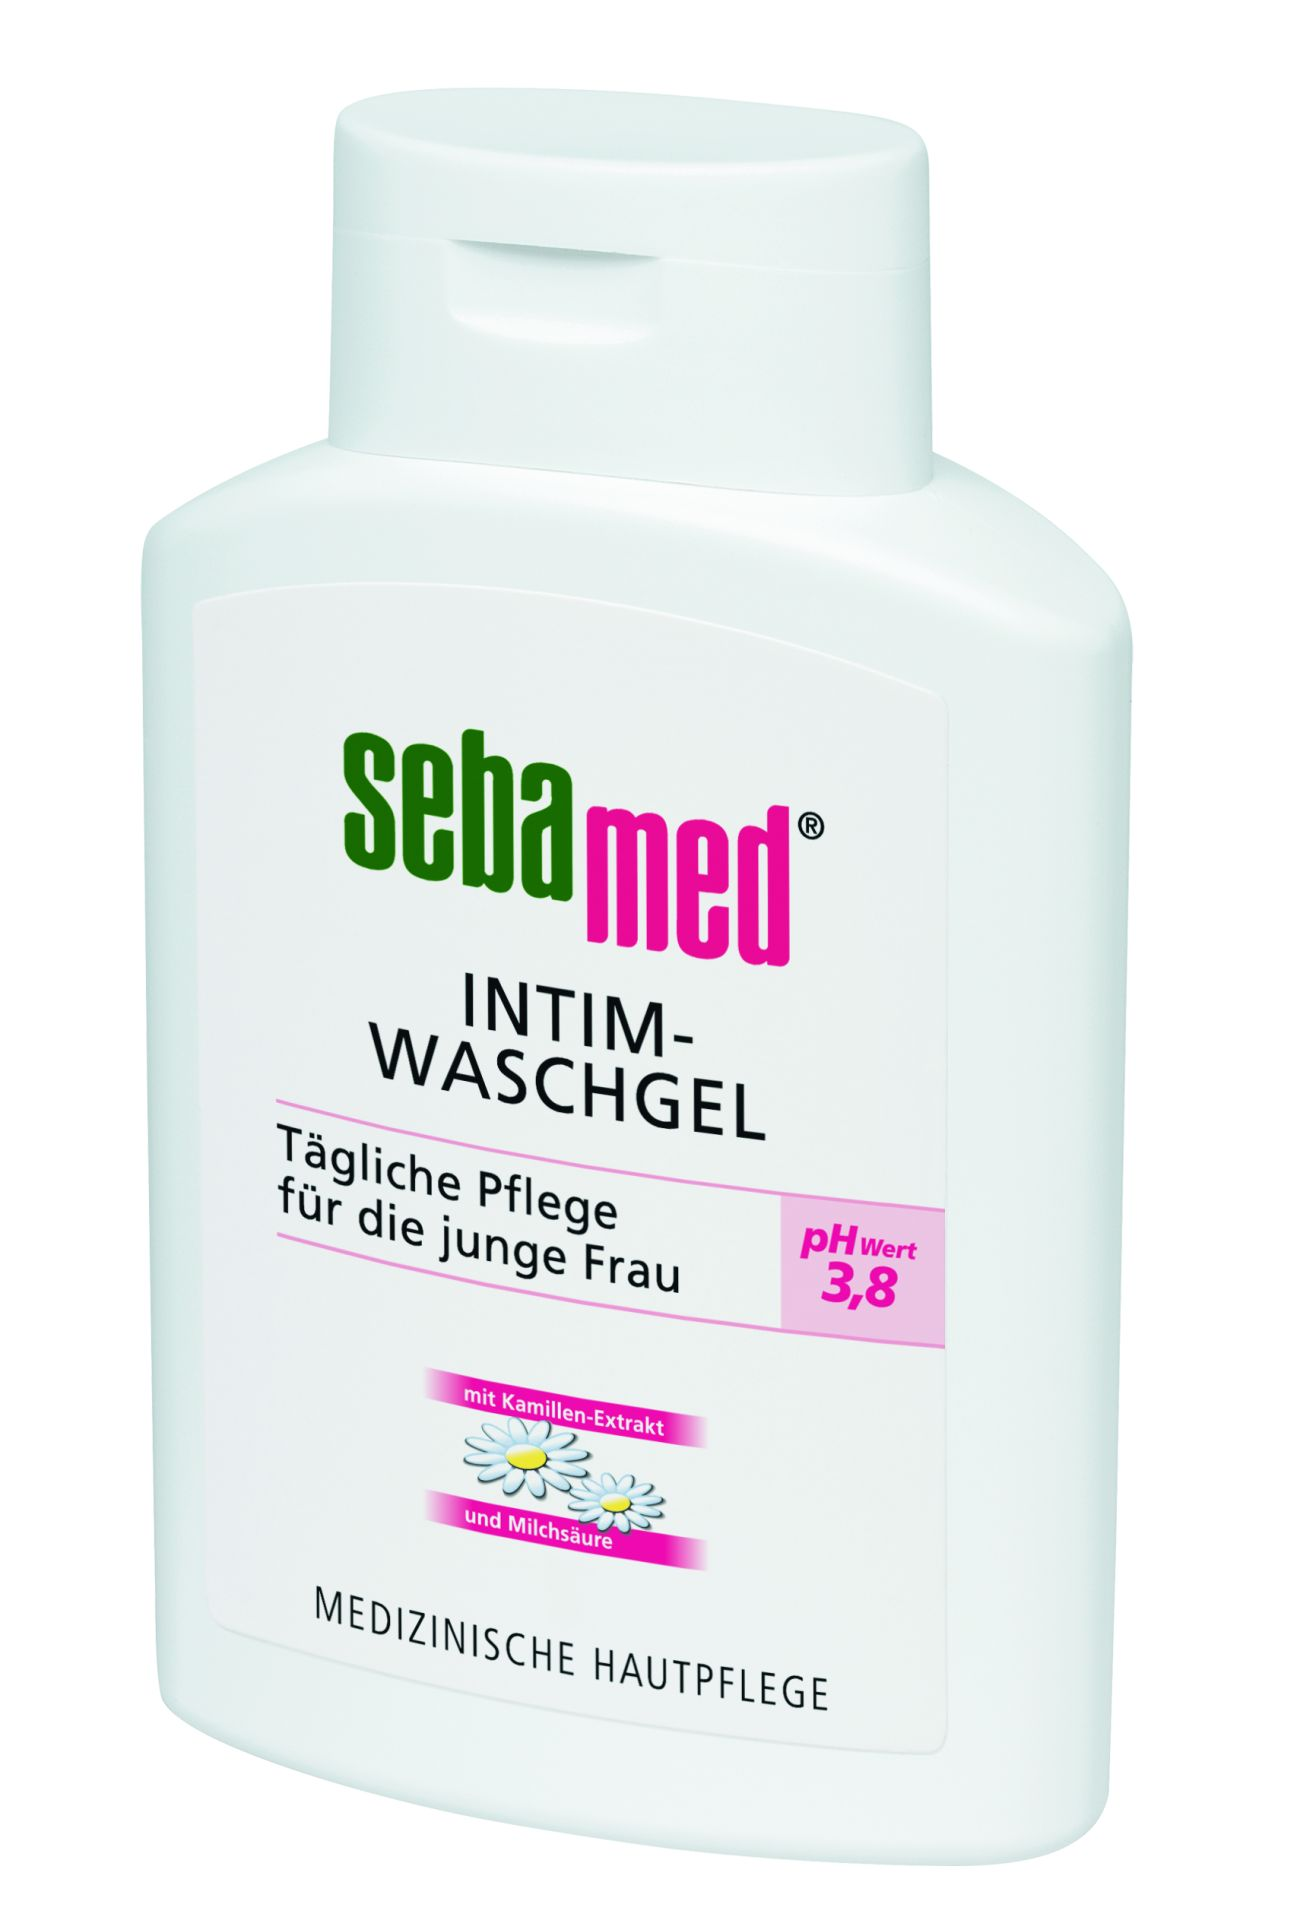 Sebamed Intimate Wash Gel 200 Ml Buy At Kidsroom Baby Care Face Body